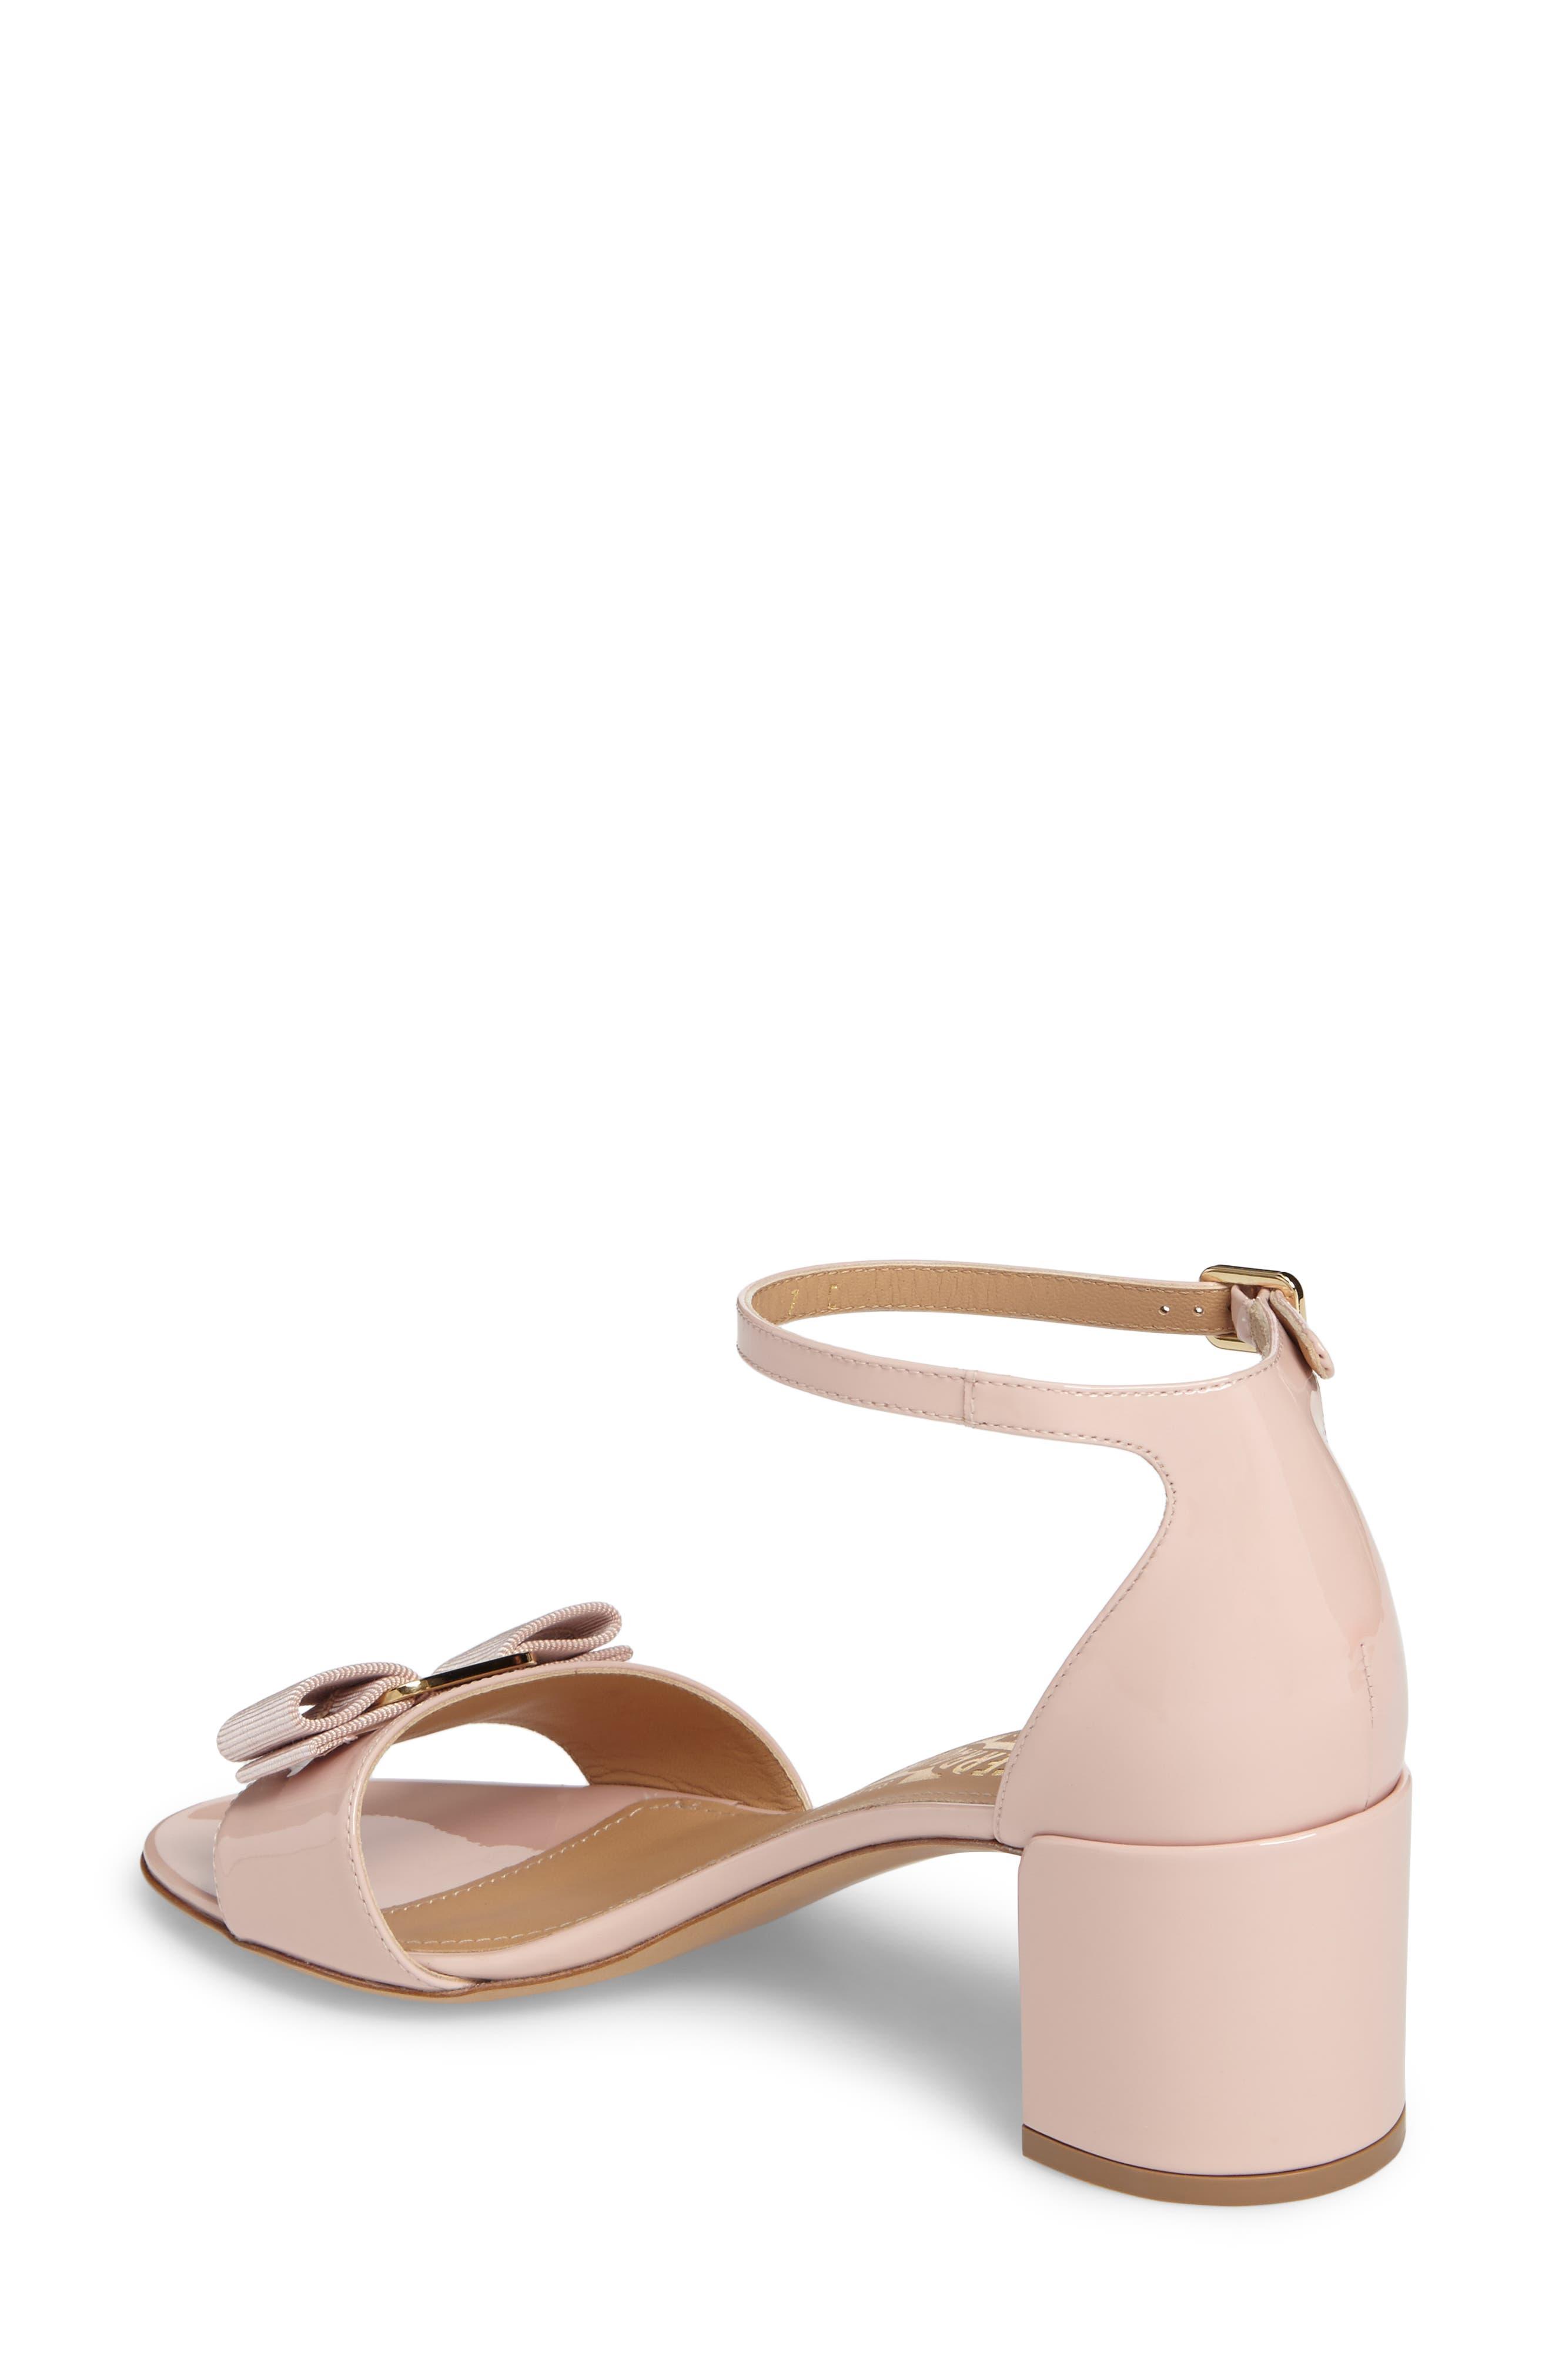 Gavina Ankle Strap Sandal,                             Alternate thumbnail 2, color,                             Bon Bon Pink